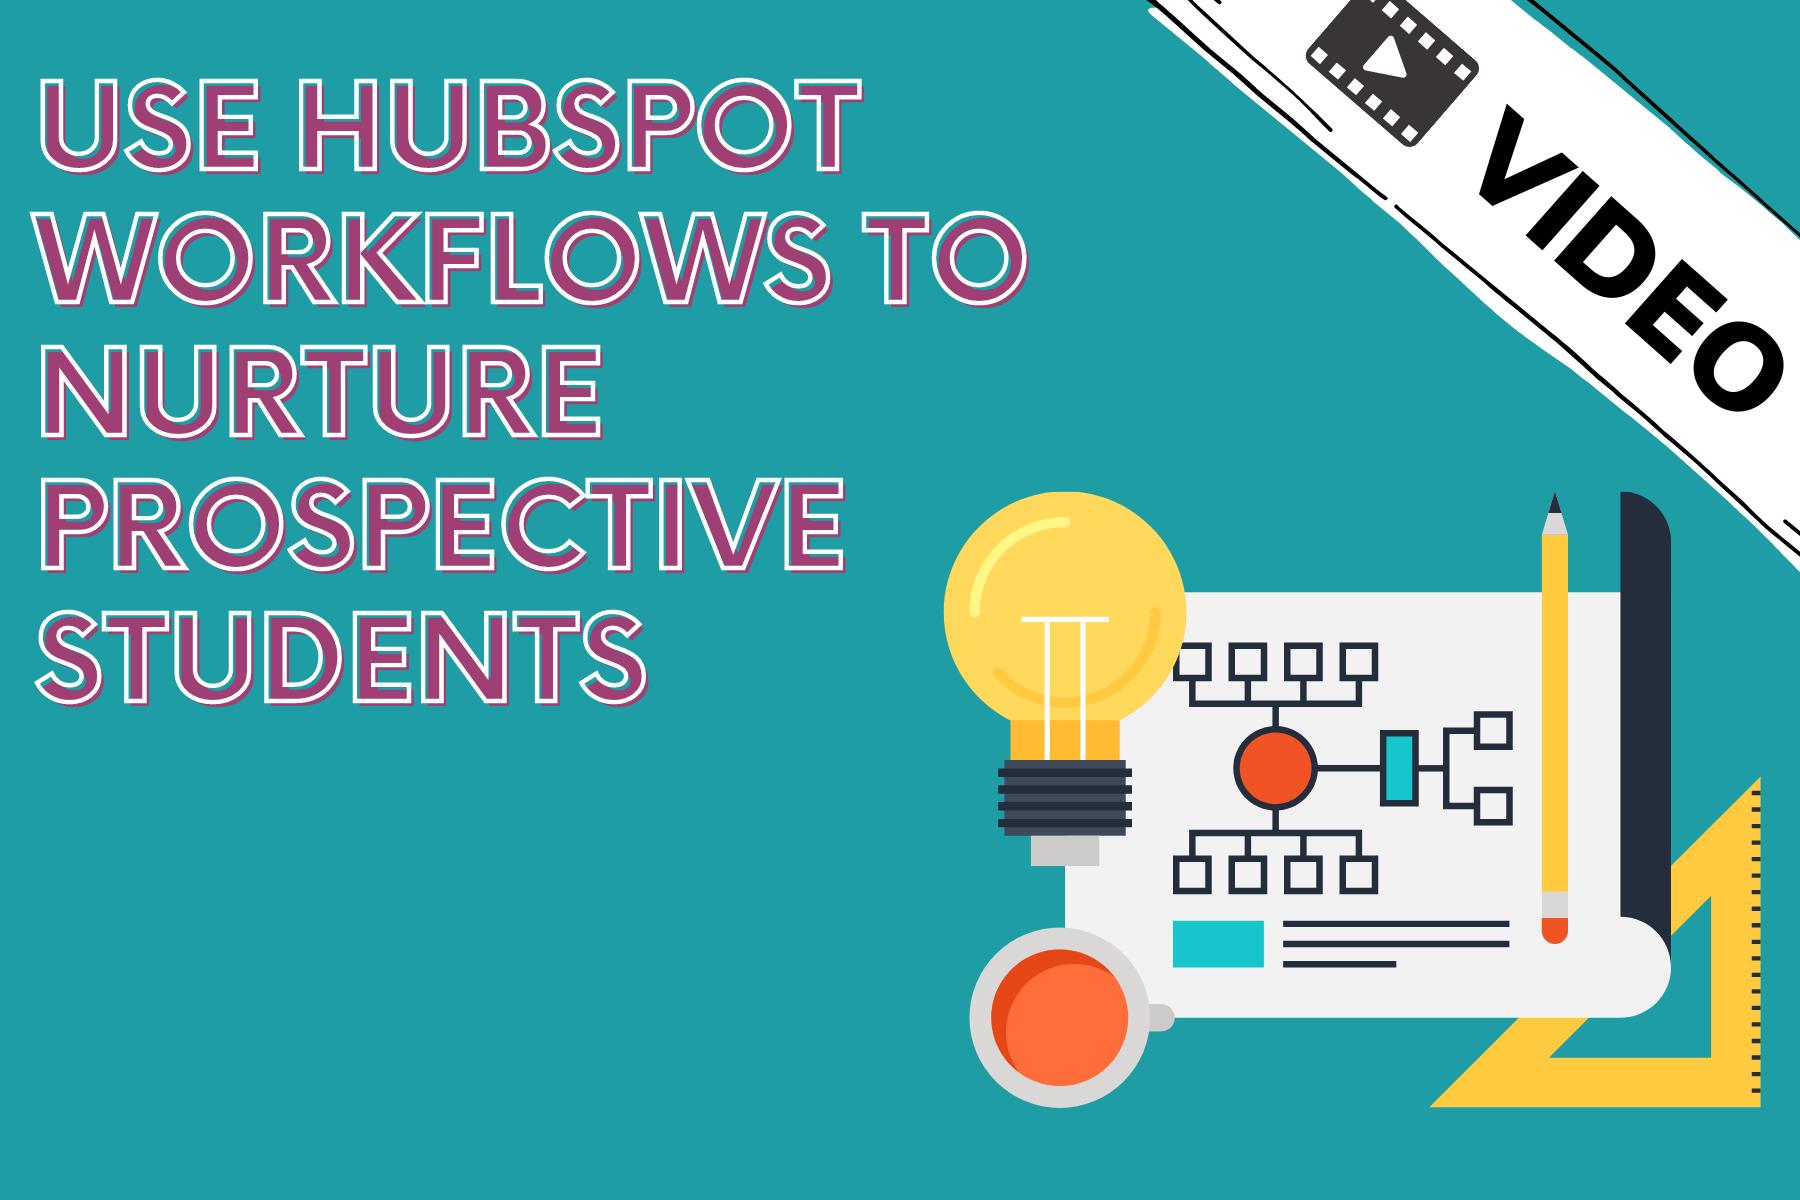 HubSpot workflow in education